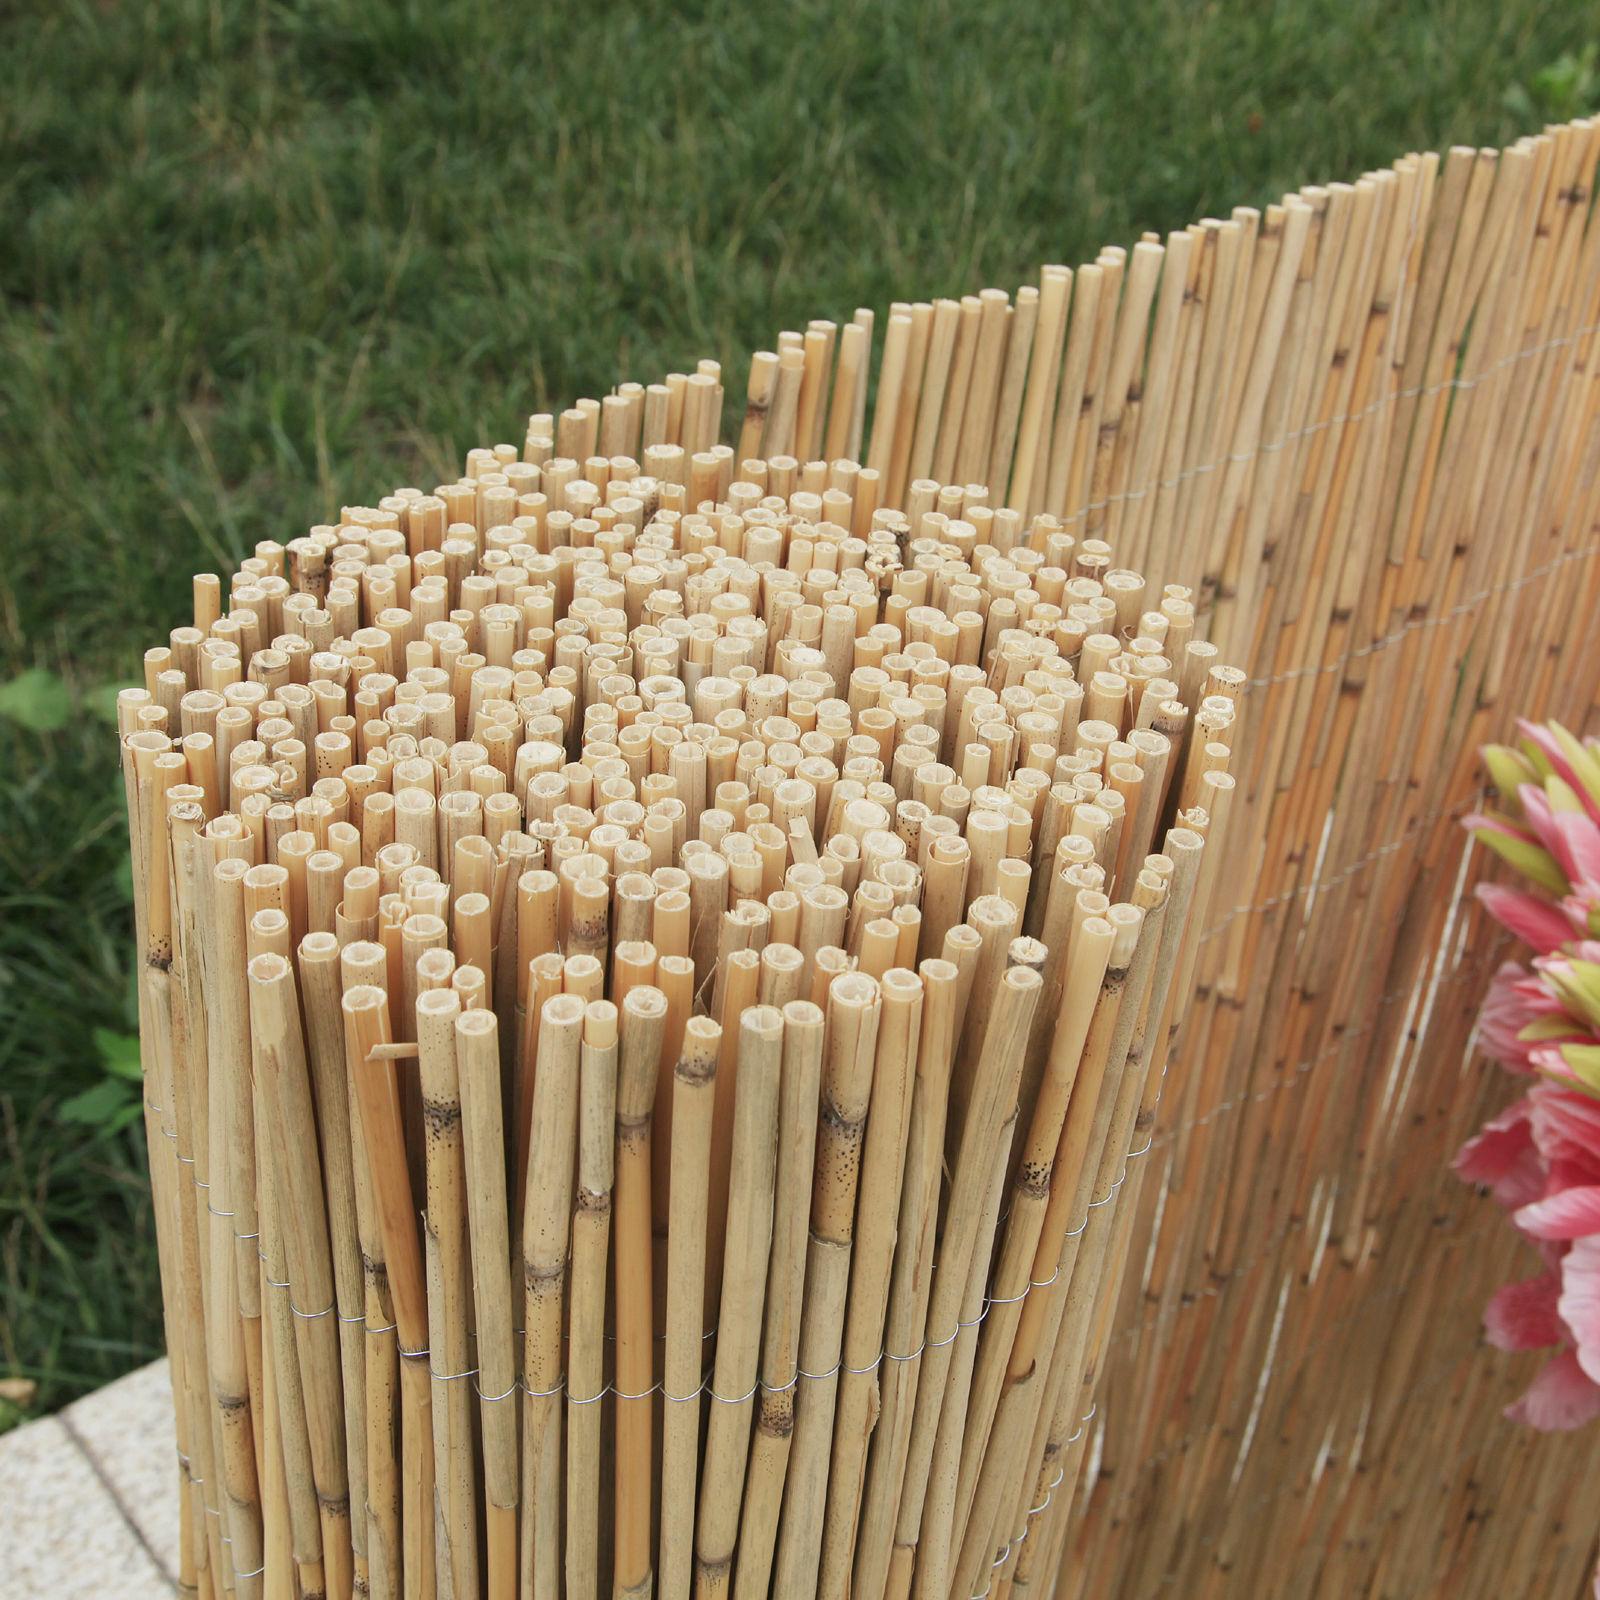 Schilfrohrmatte Schilf Schilfmatte Sichtschutz Bambus Garten Balkon Zaun Deko